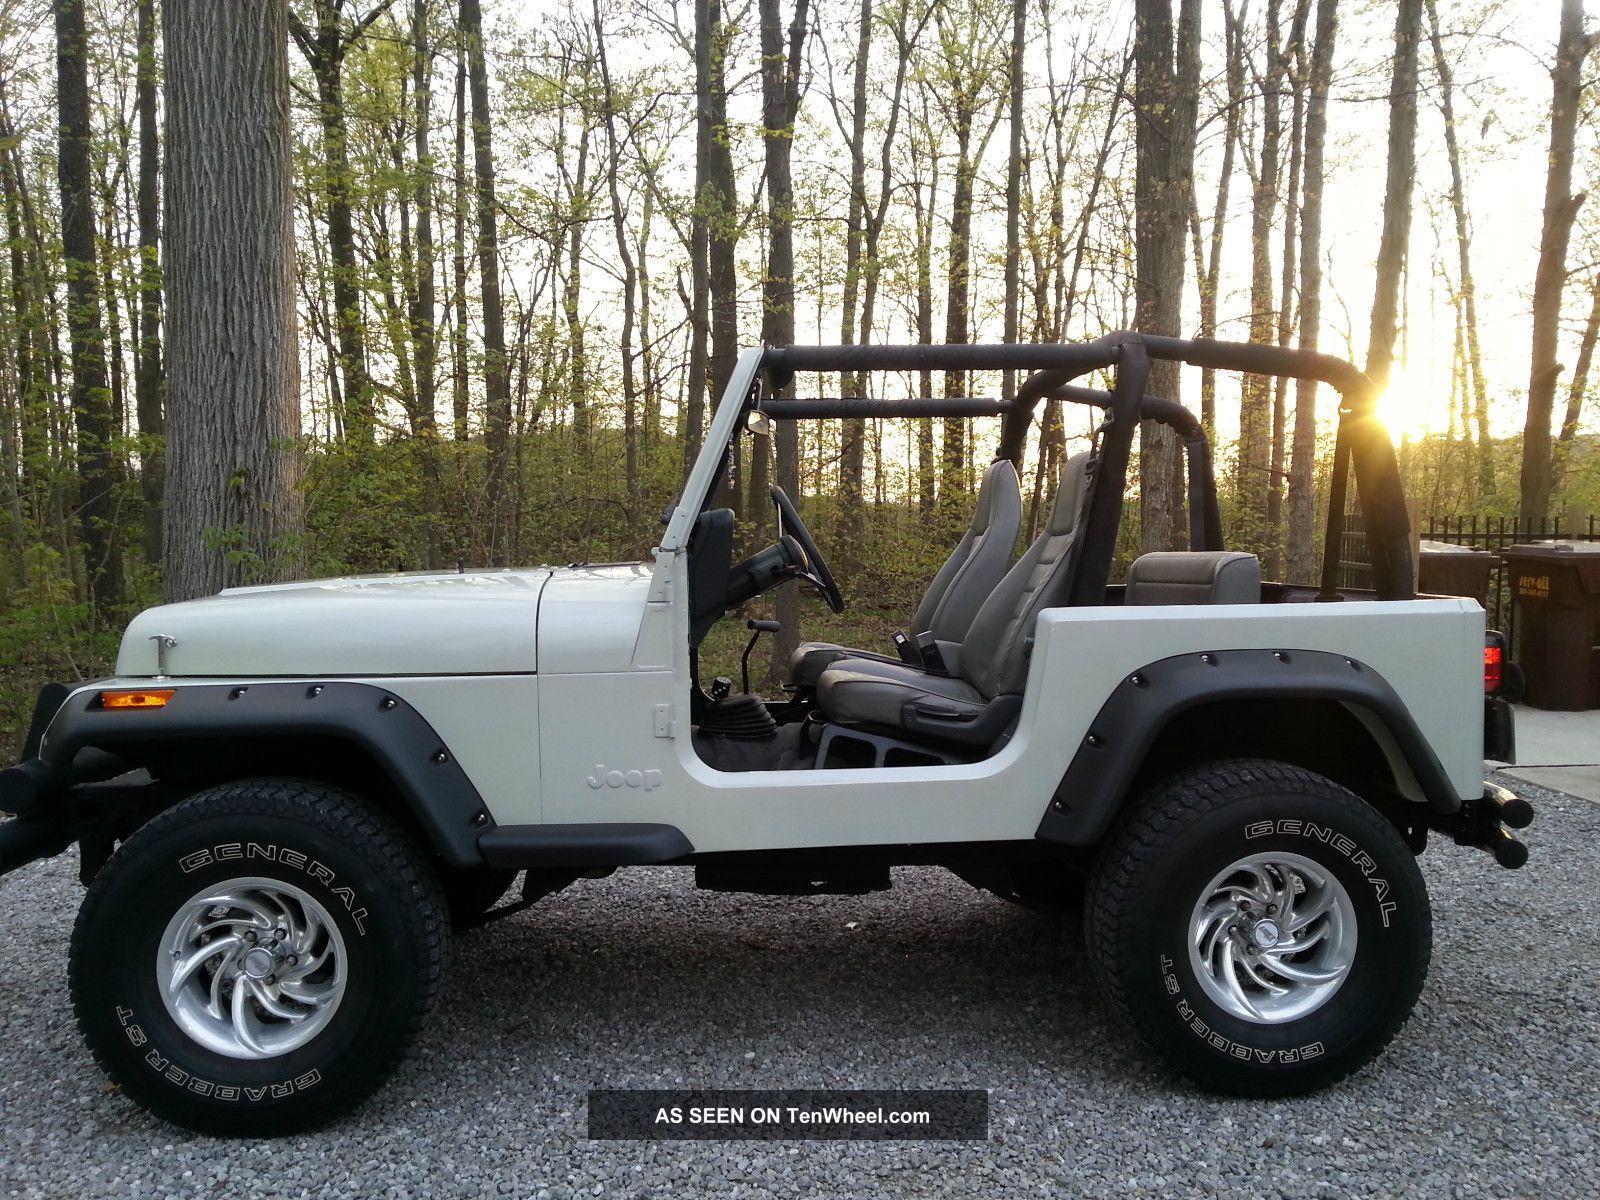 1995 Jeep Wrangler Rio Grande Sport Utility This Was My First Wrangler Jeep Wrangler Jeep Wrangler Yj Jeep Yj